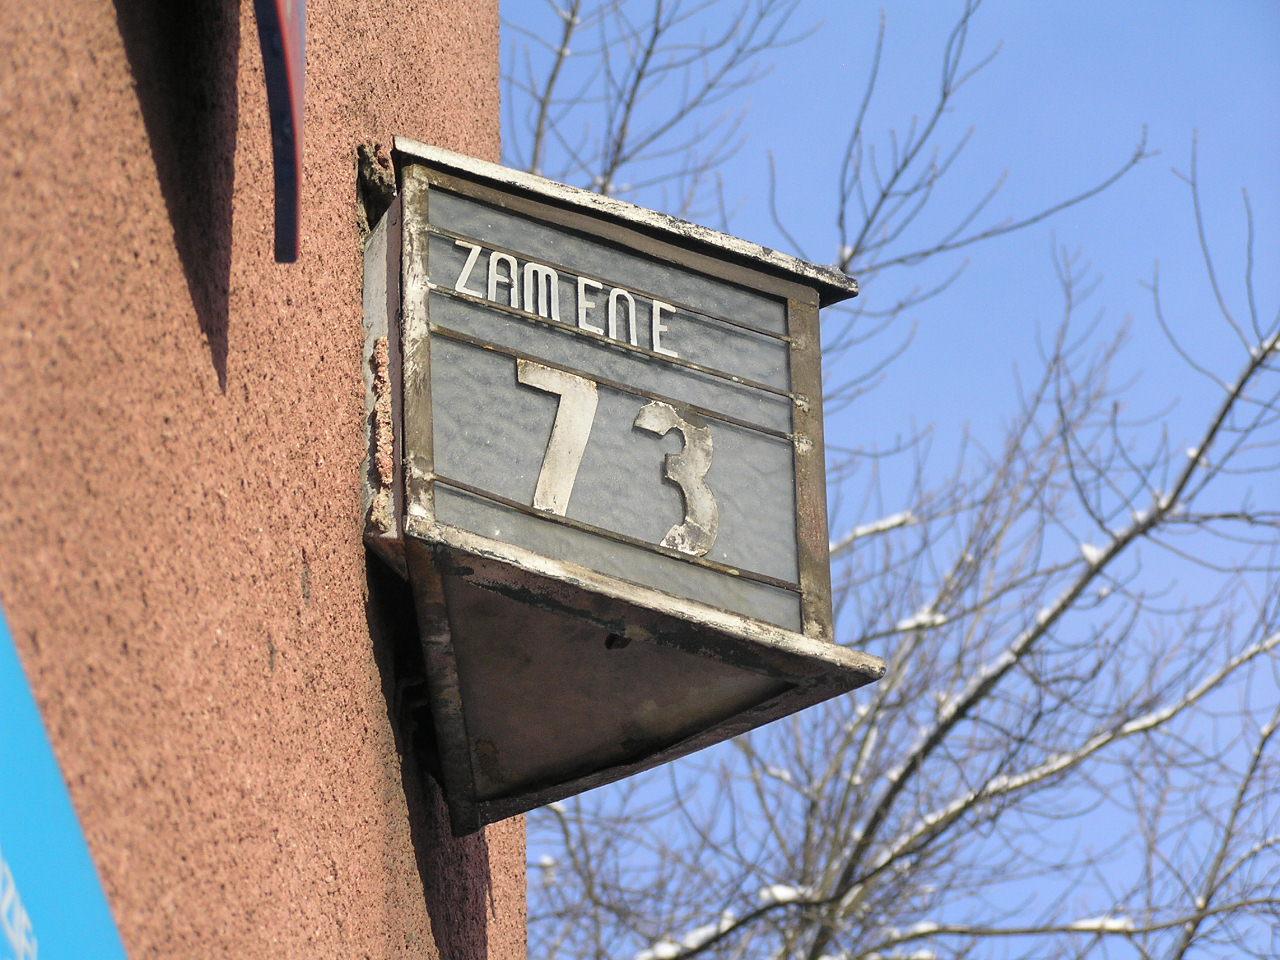 Latarenka adresowa - Zamieniecka 73